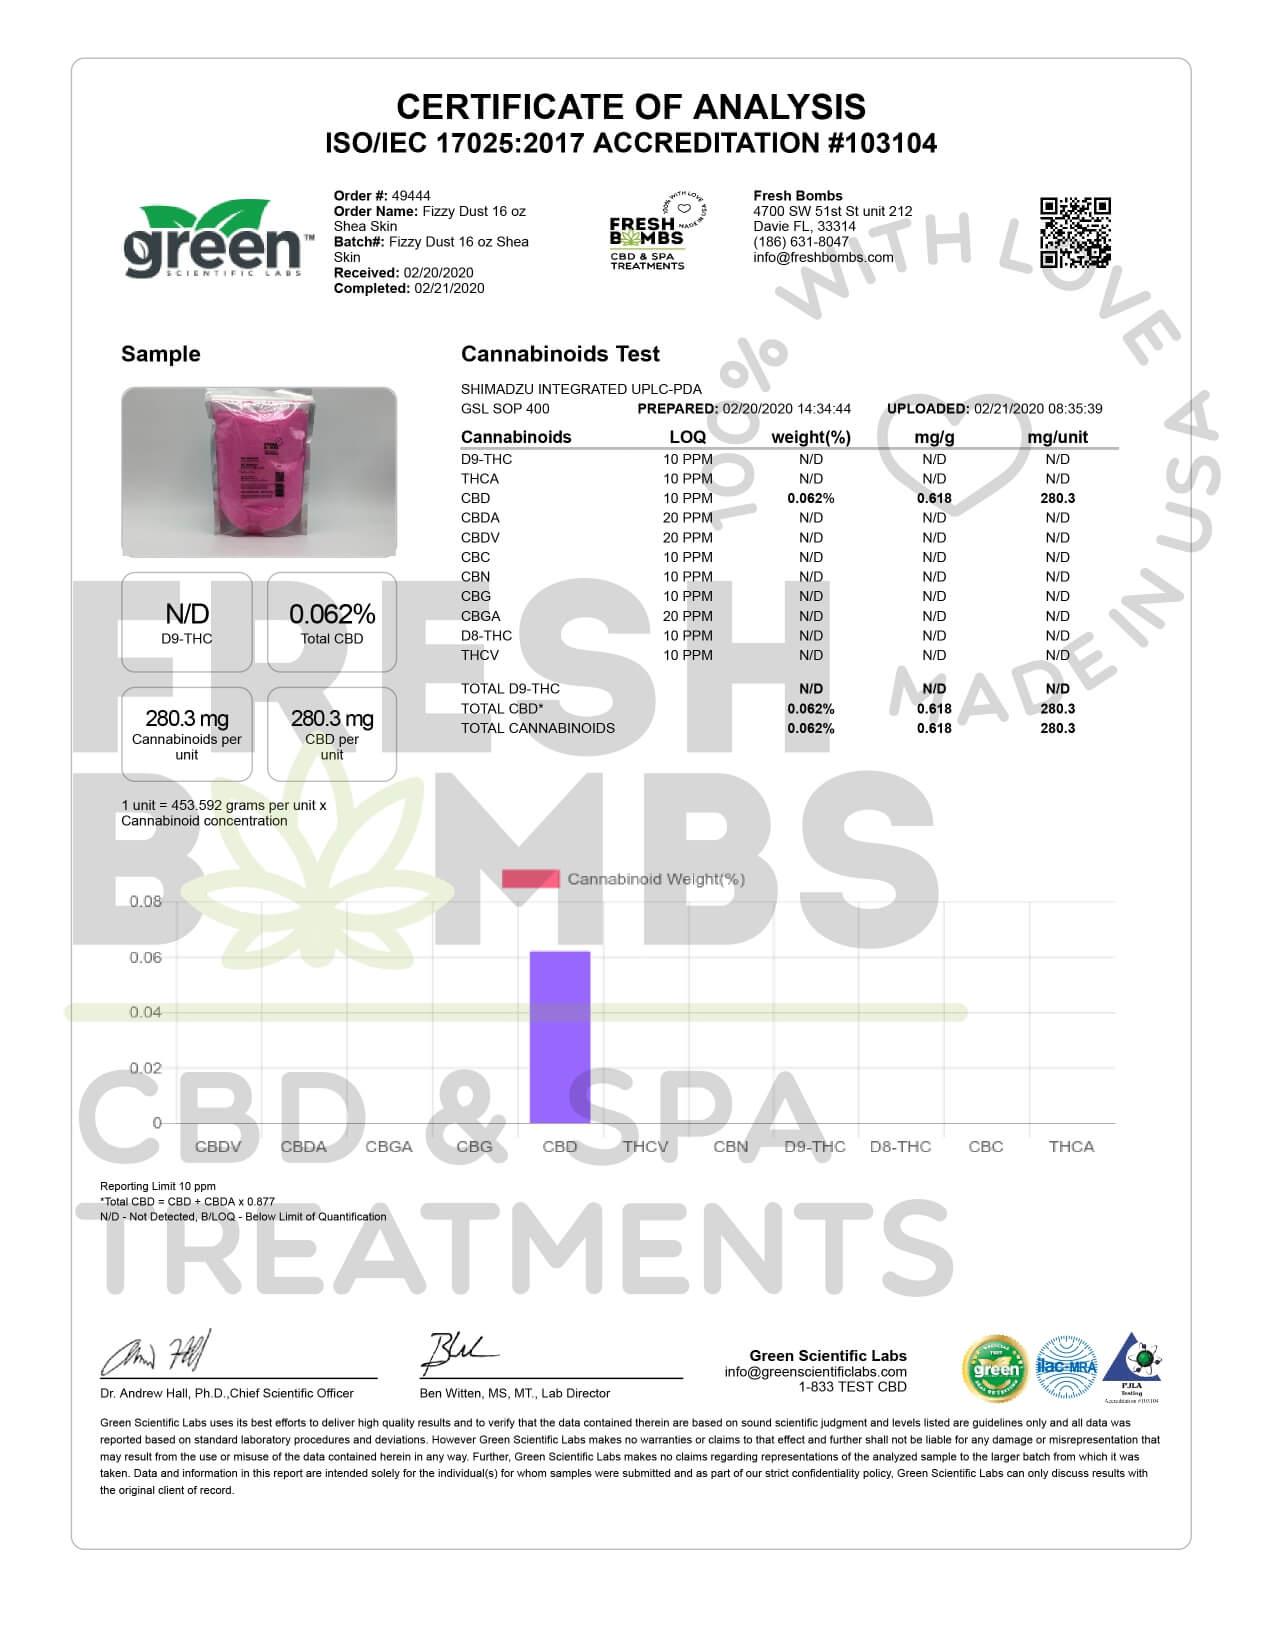 Fresh Bombs CBD Bath Shea Skin Healer Fizzy Dust 250mg Lab Report